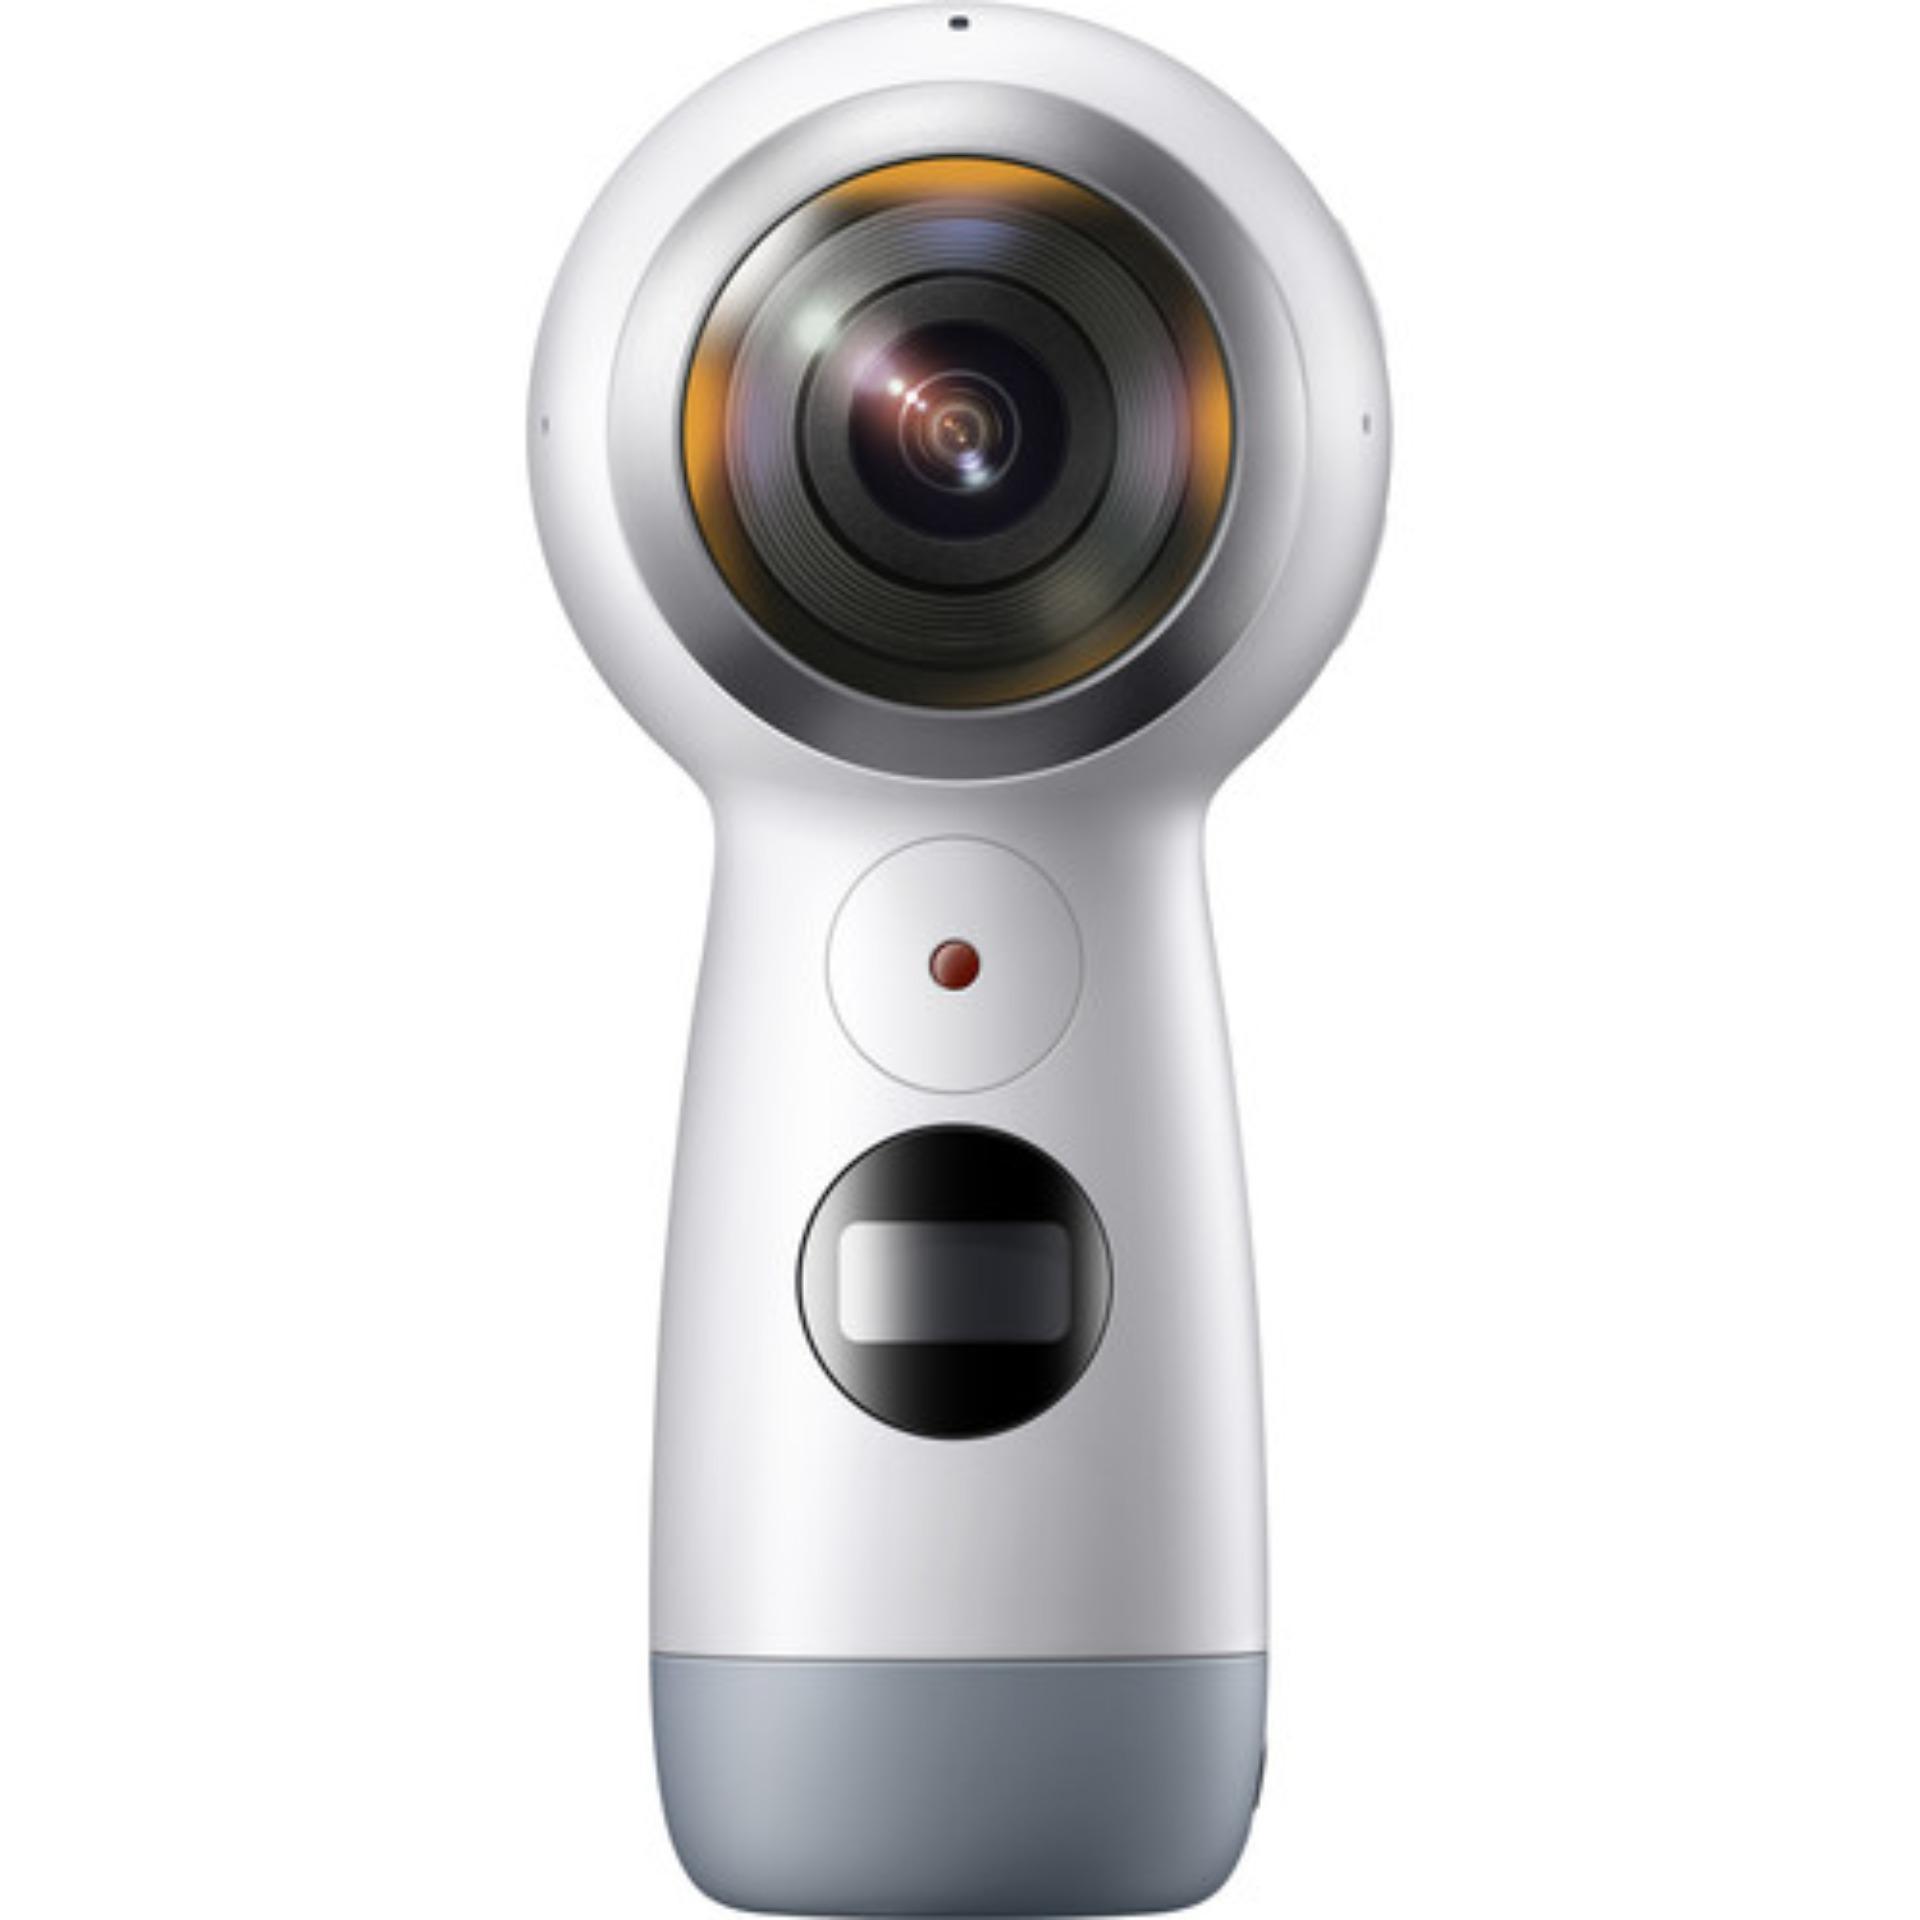 Samsung Gear 360 4K Spherical VR Camera (2017) SM-R210